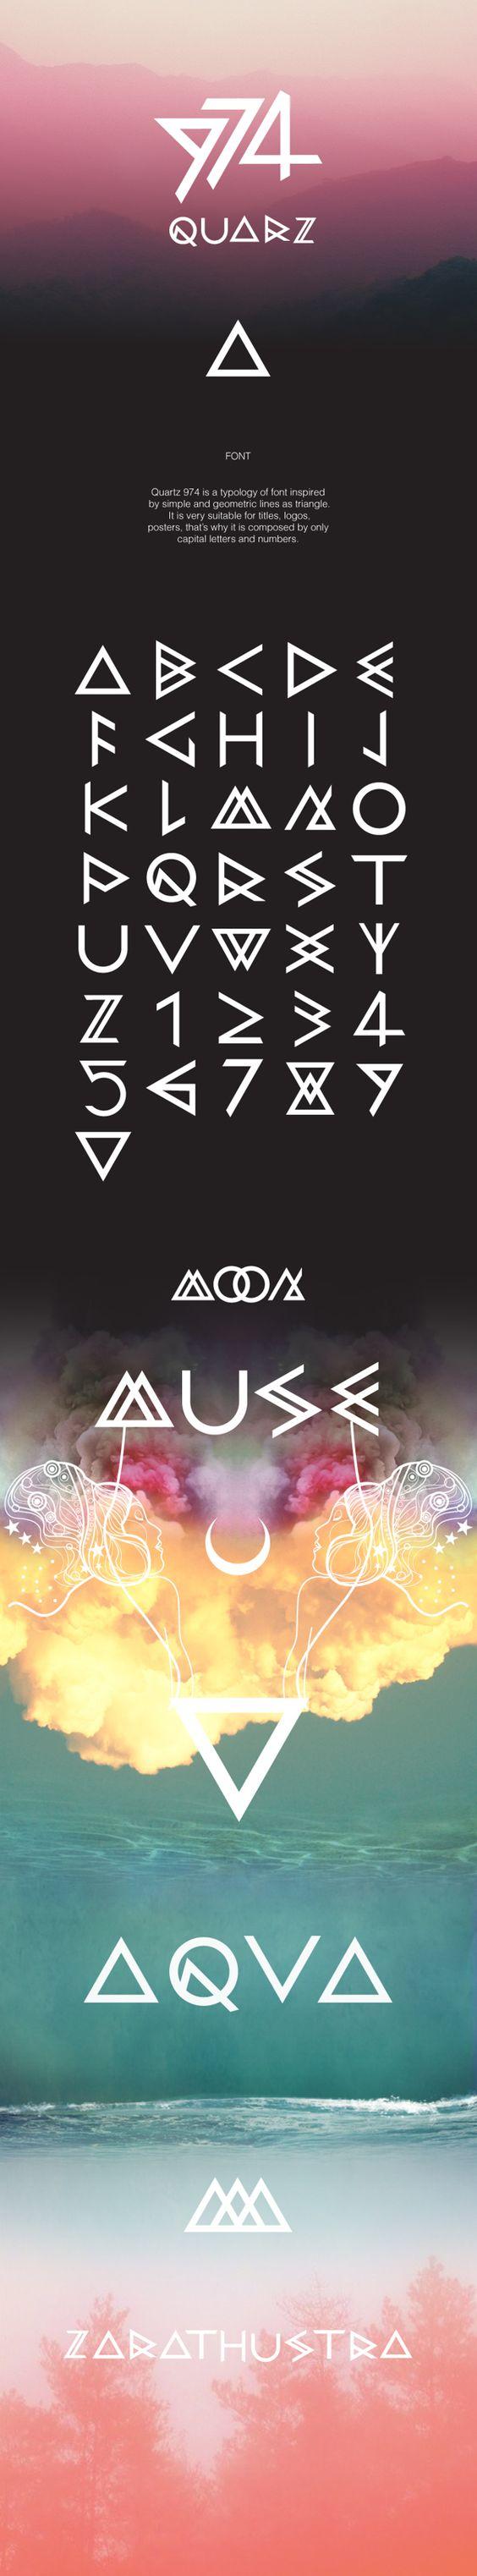 QUARZ 974 by Domenico Ruffo, via Behance , font , typography , triangle , poster , geometric , decorative